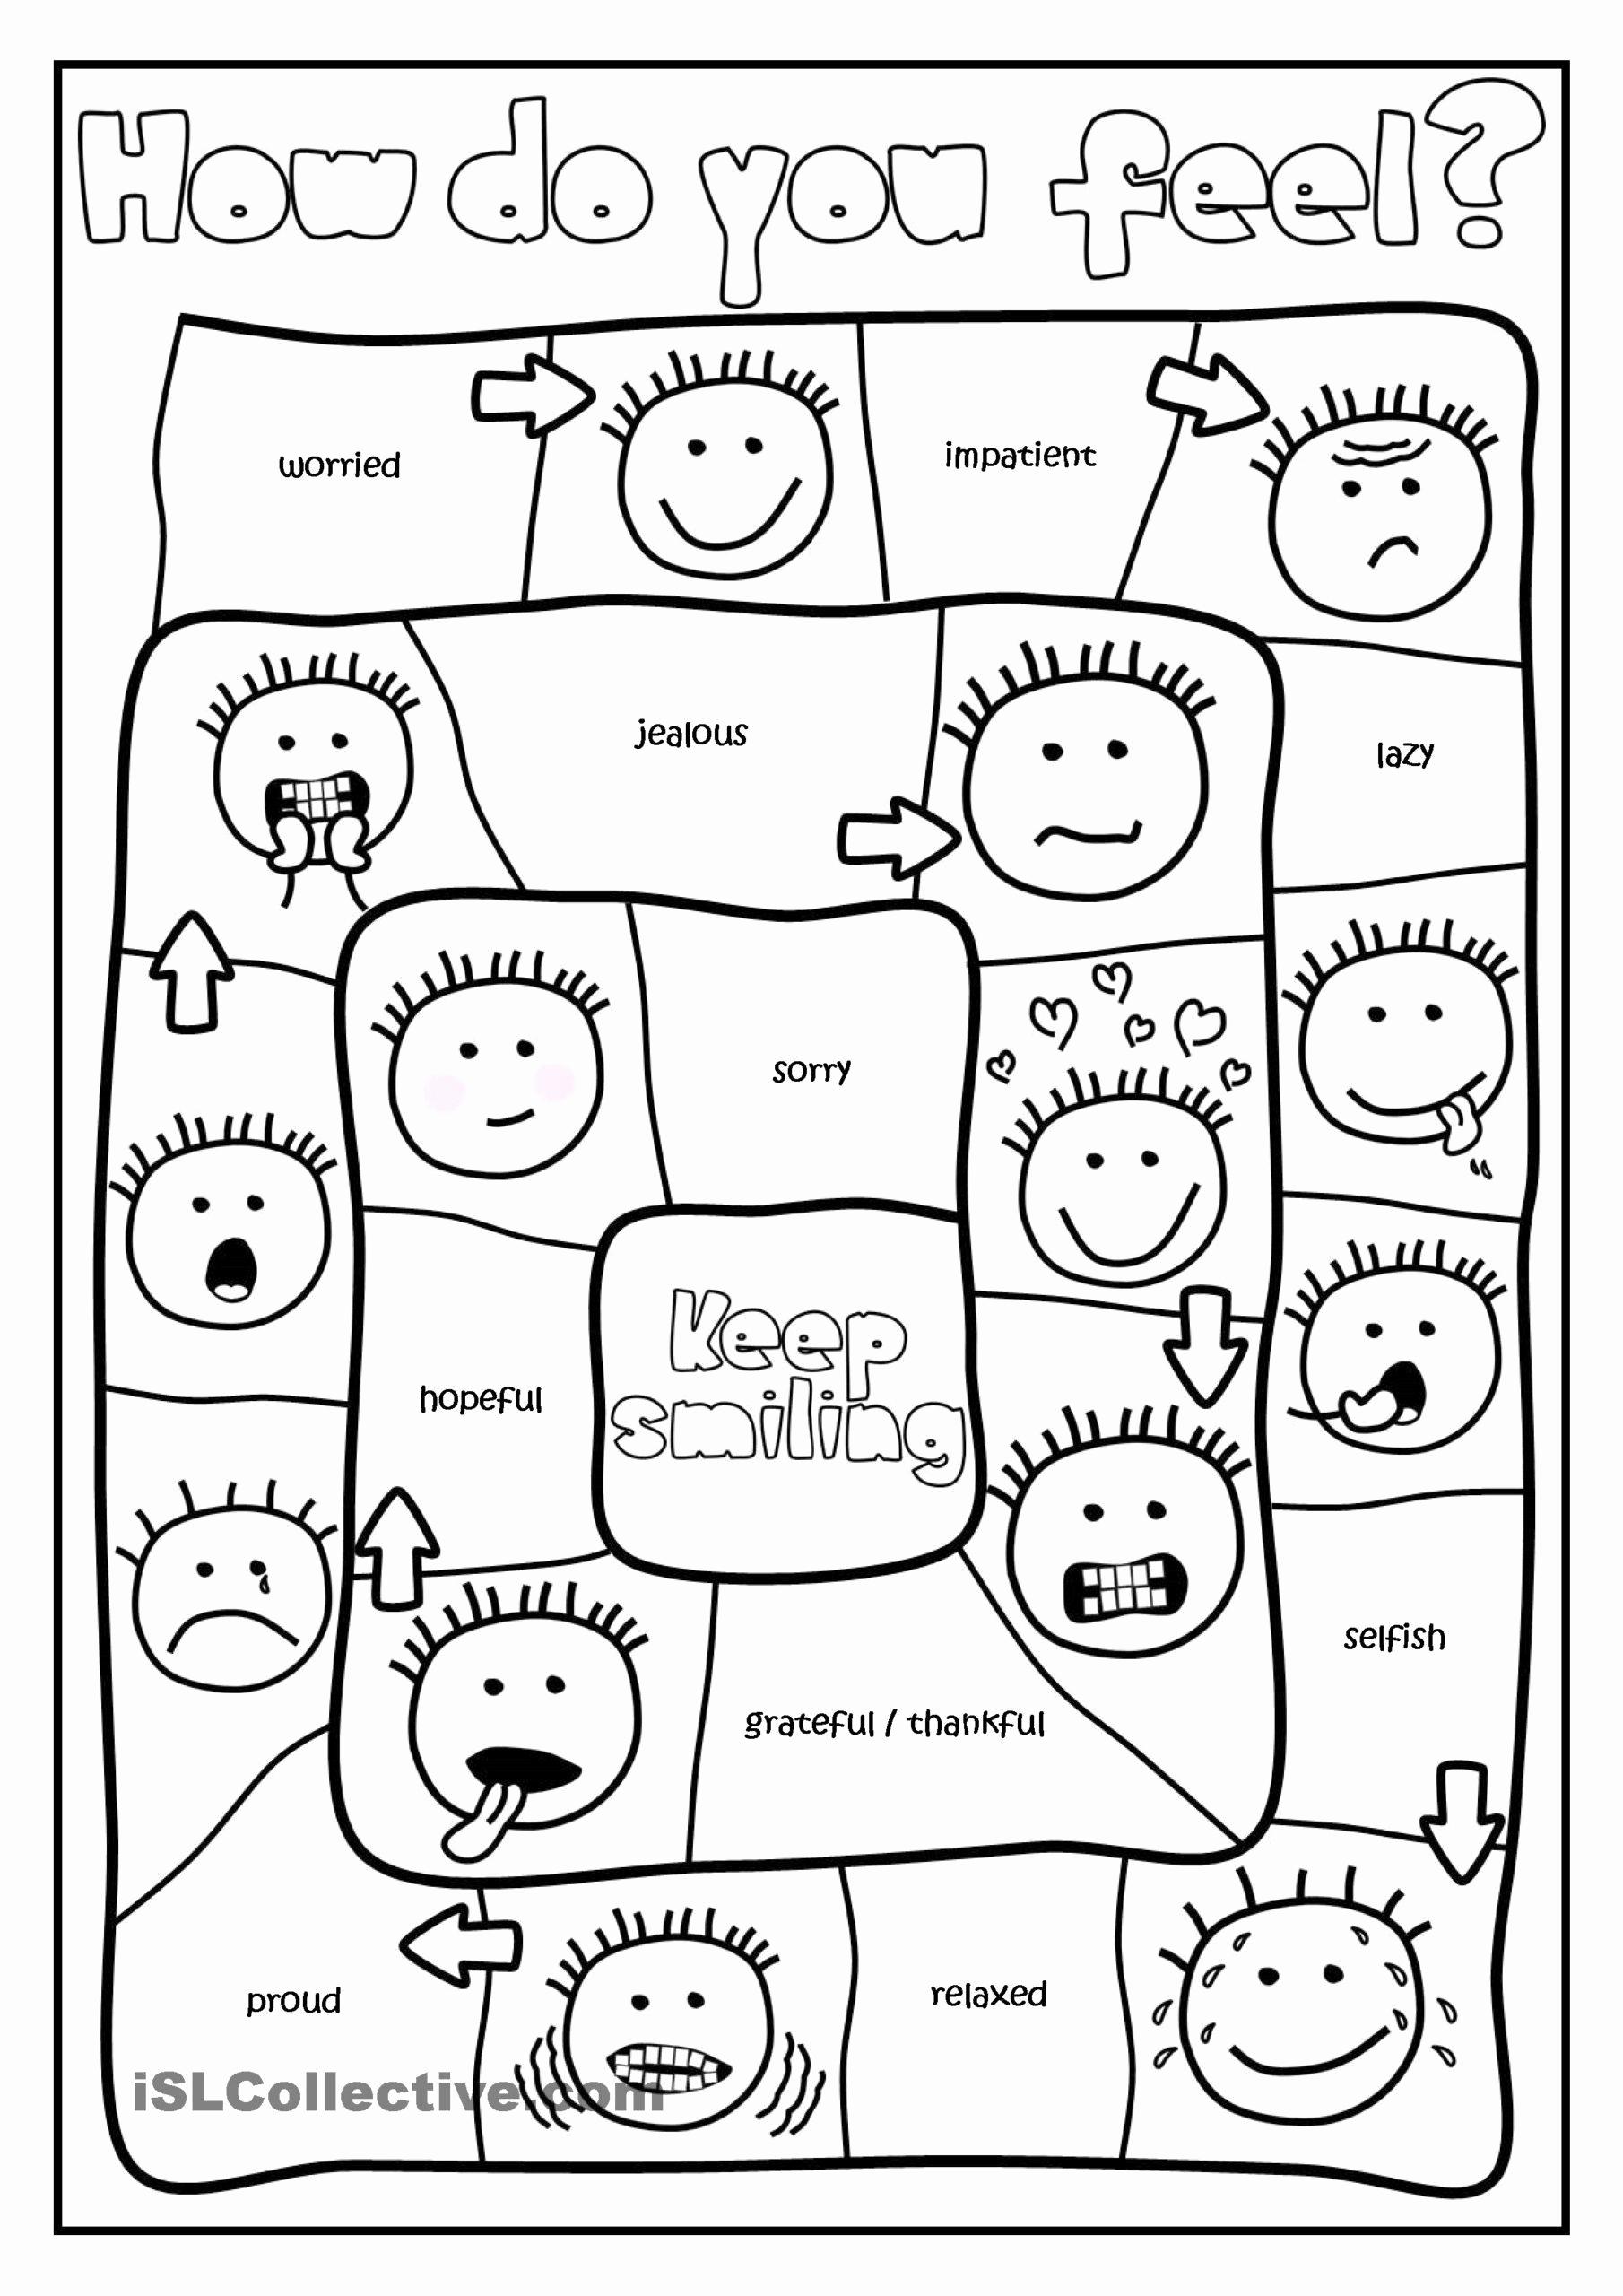 Emotions Worksheets for Preschoolers Lovely Free Printable Feelings Worksheets for Preschoolers